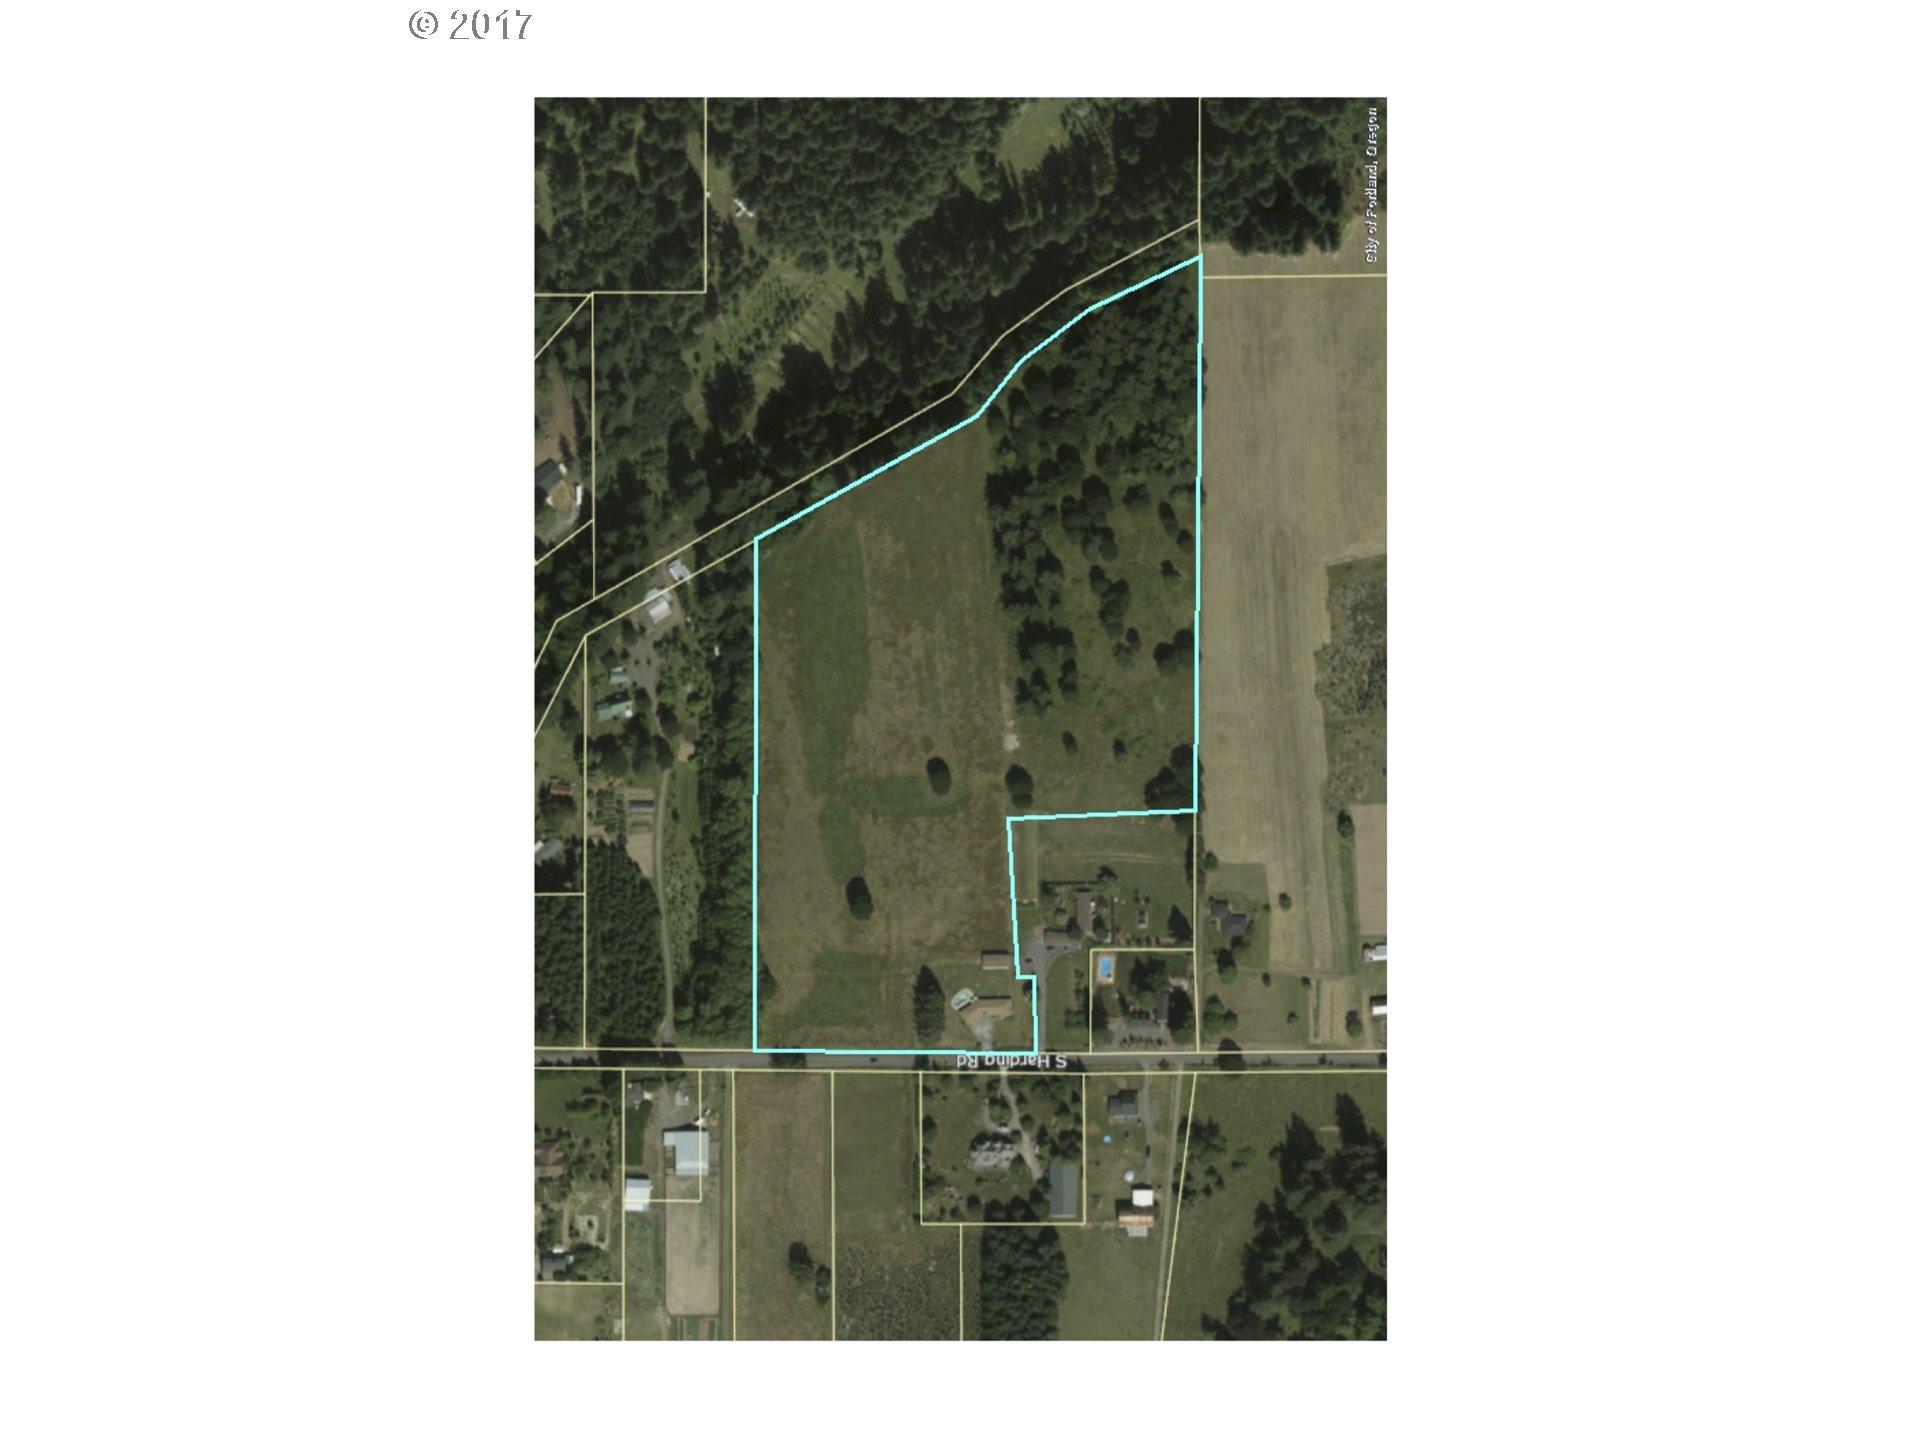 16010 S HARDING RD, Oregon City, OR 97045